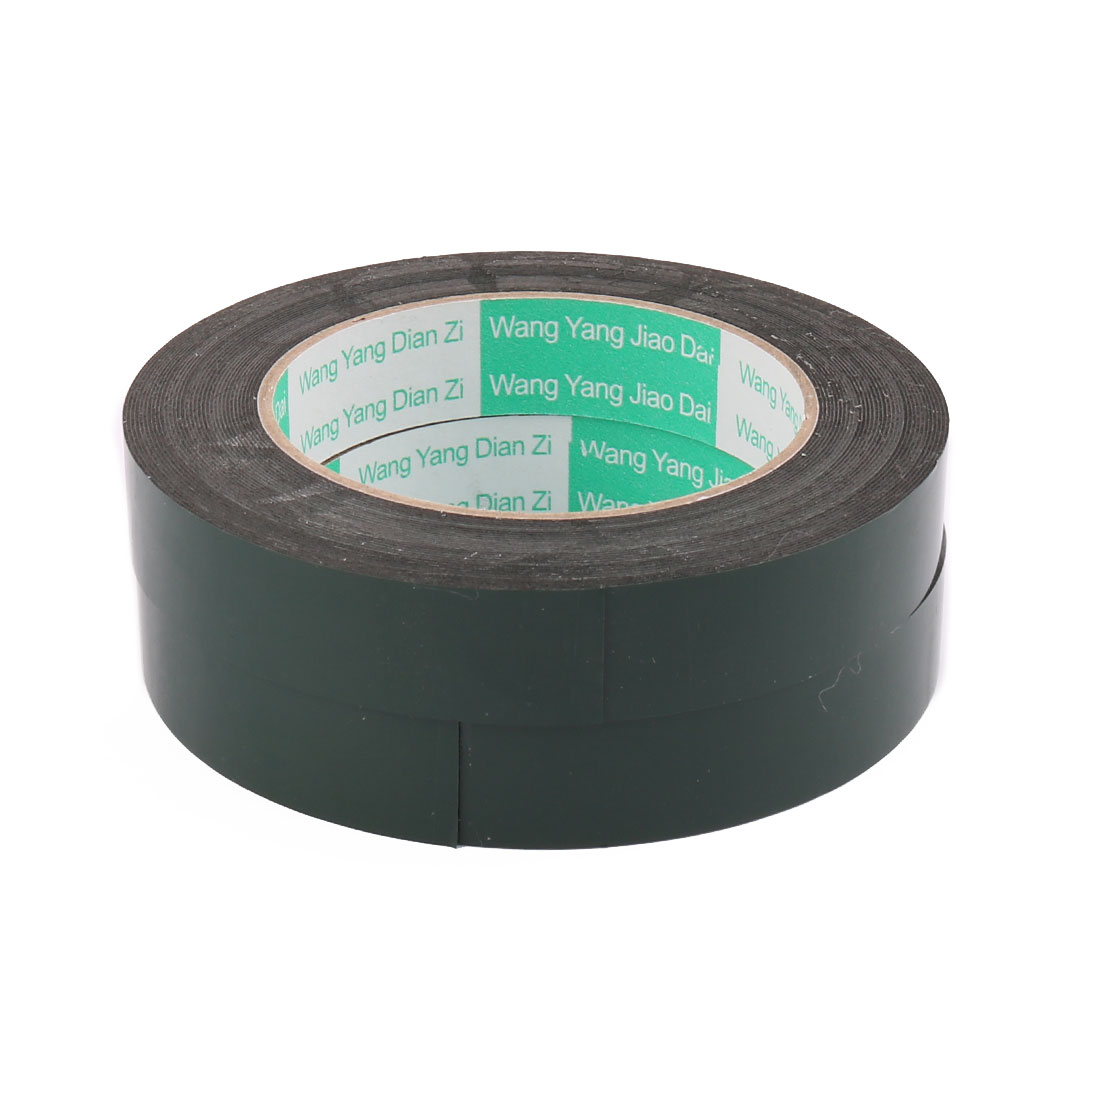 2Pcs 20mmx0.5mm Double Sided Sponge Tape Adhesive Sticker Foam Glue 10M